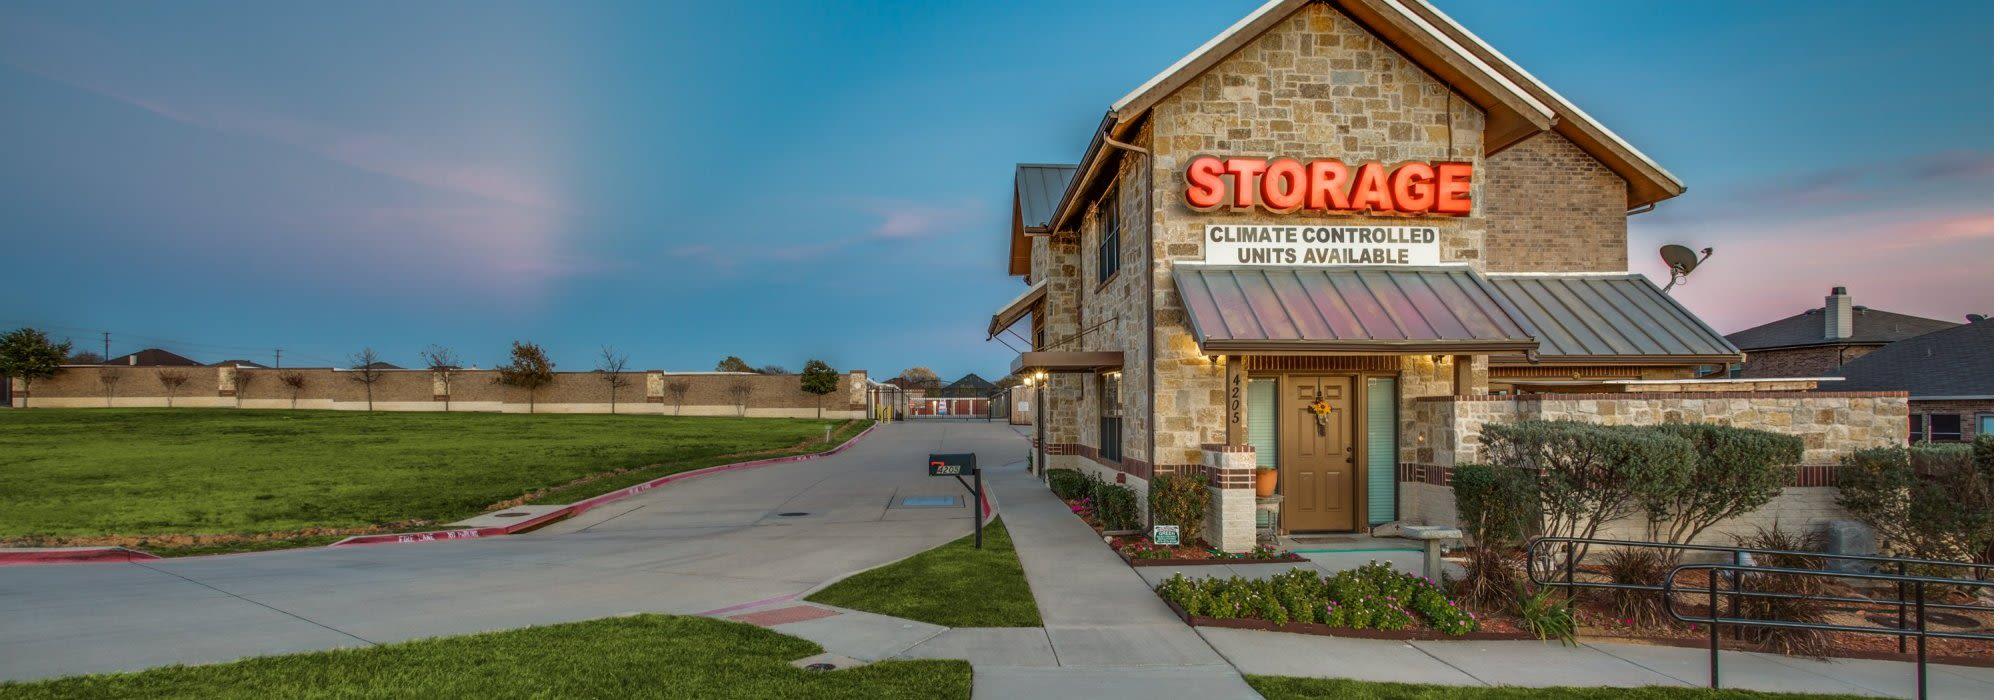 Self storage in Denton TX